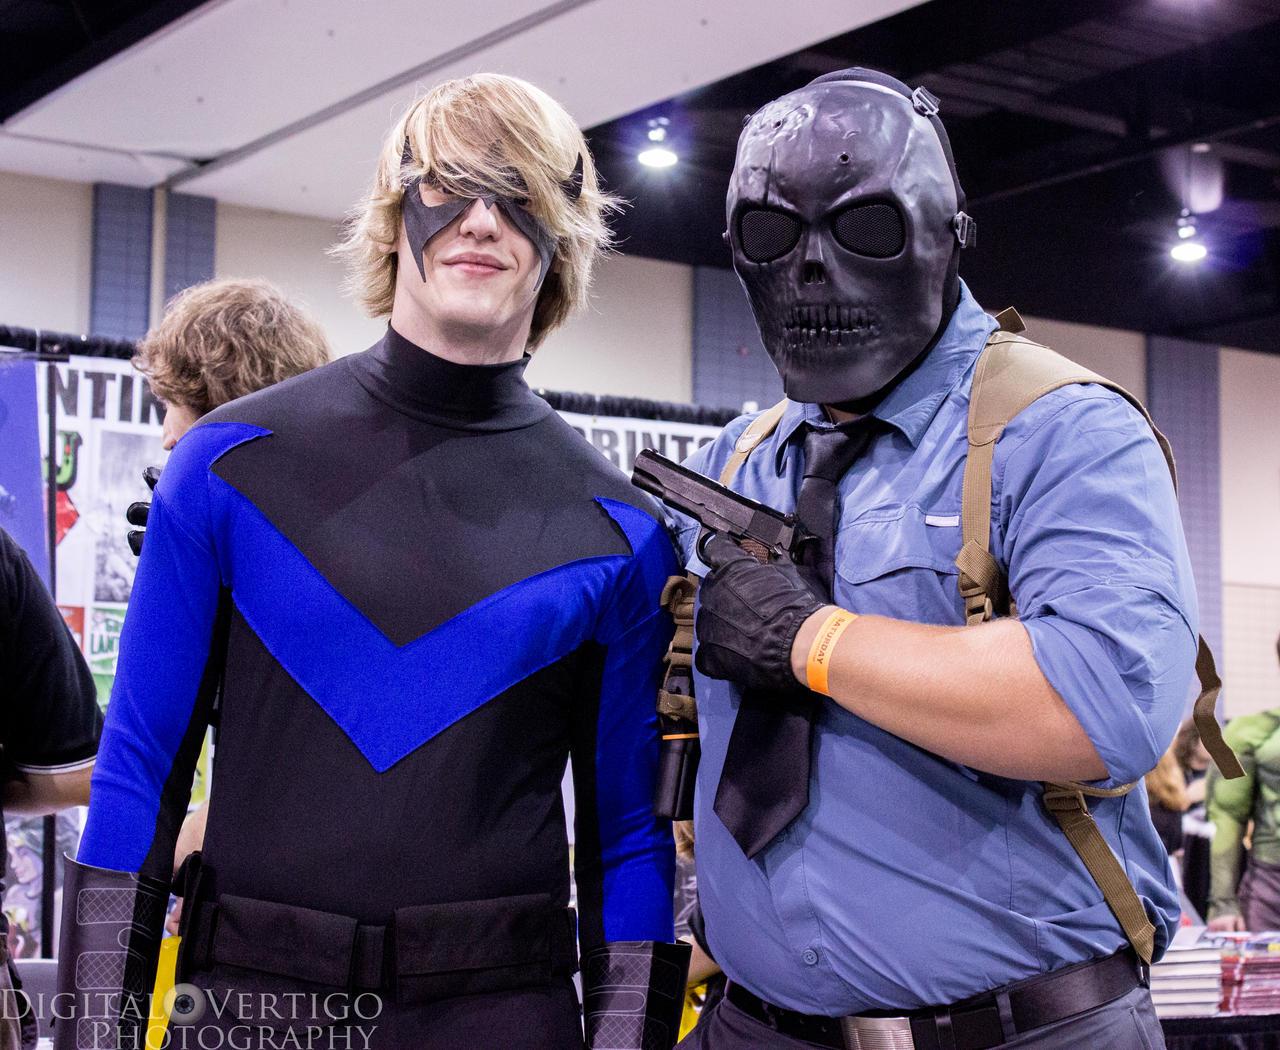 Nightwing and Black Mask by Digital-Vertigo on DeviantArt